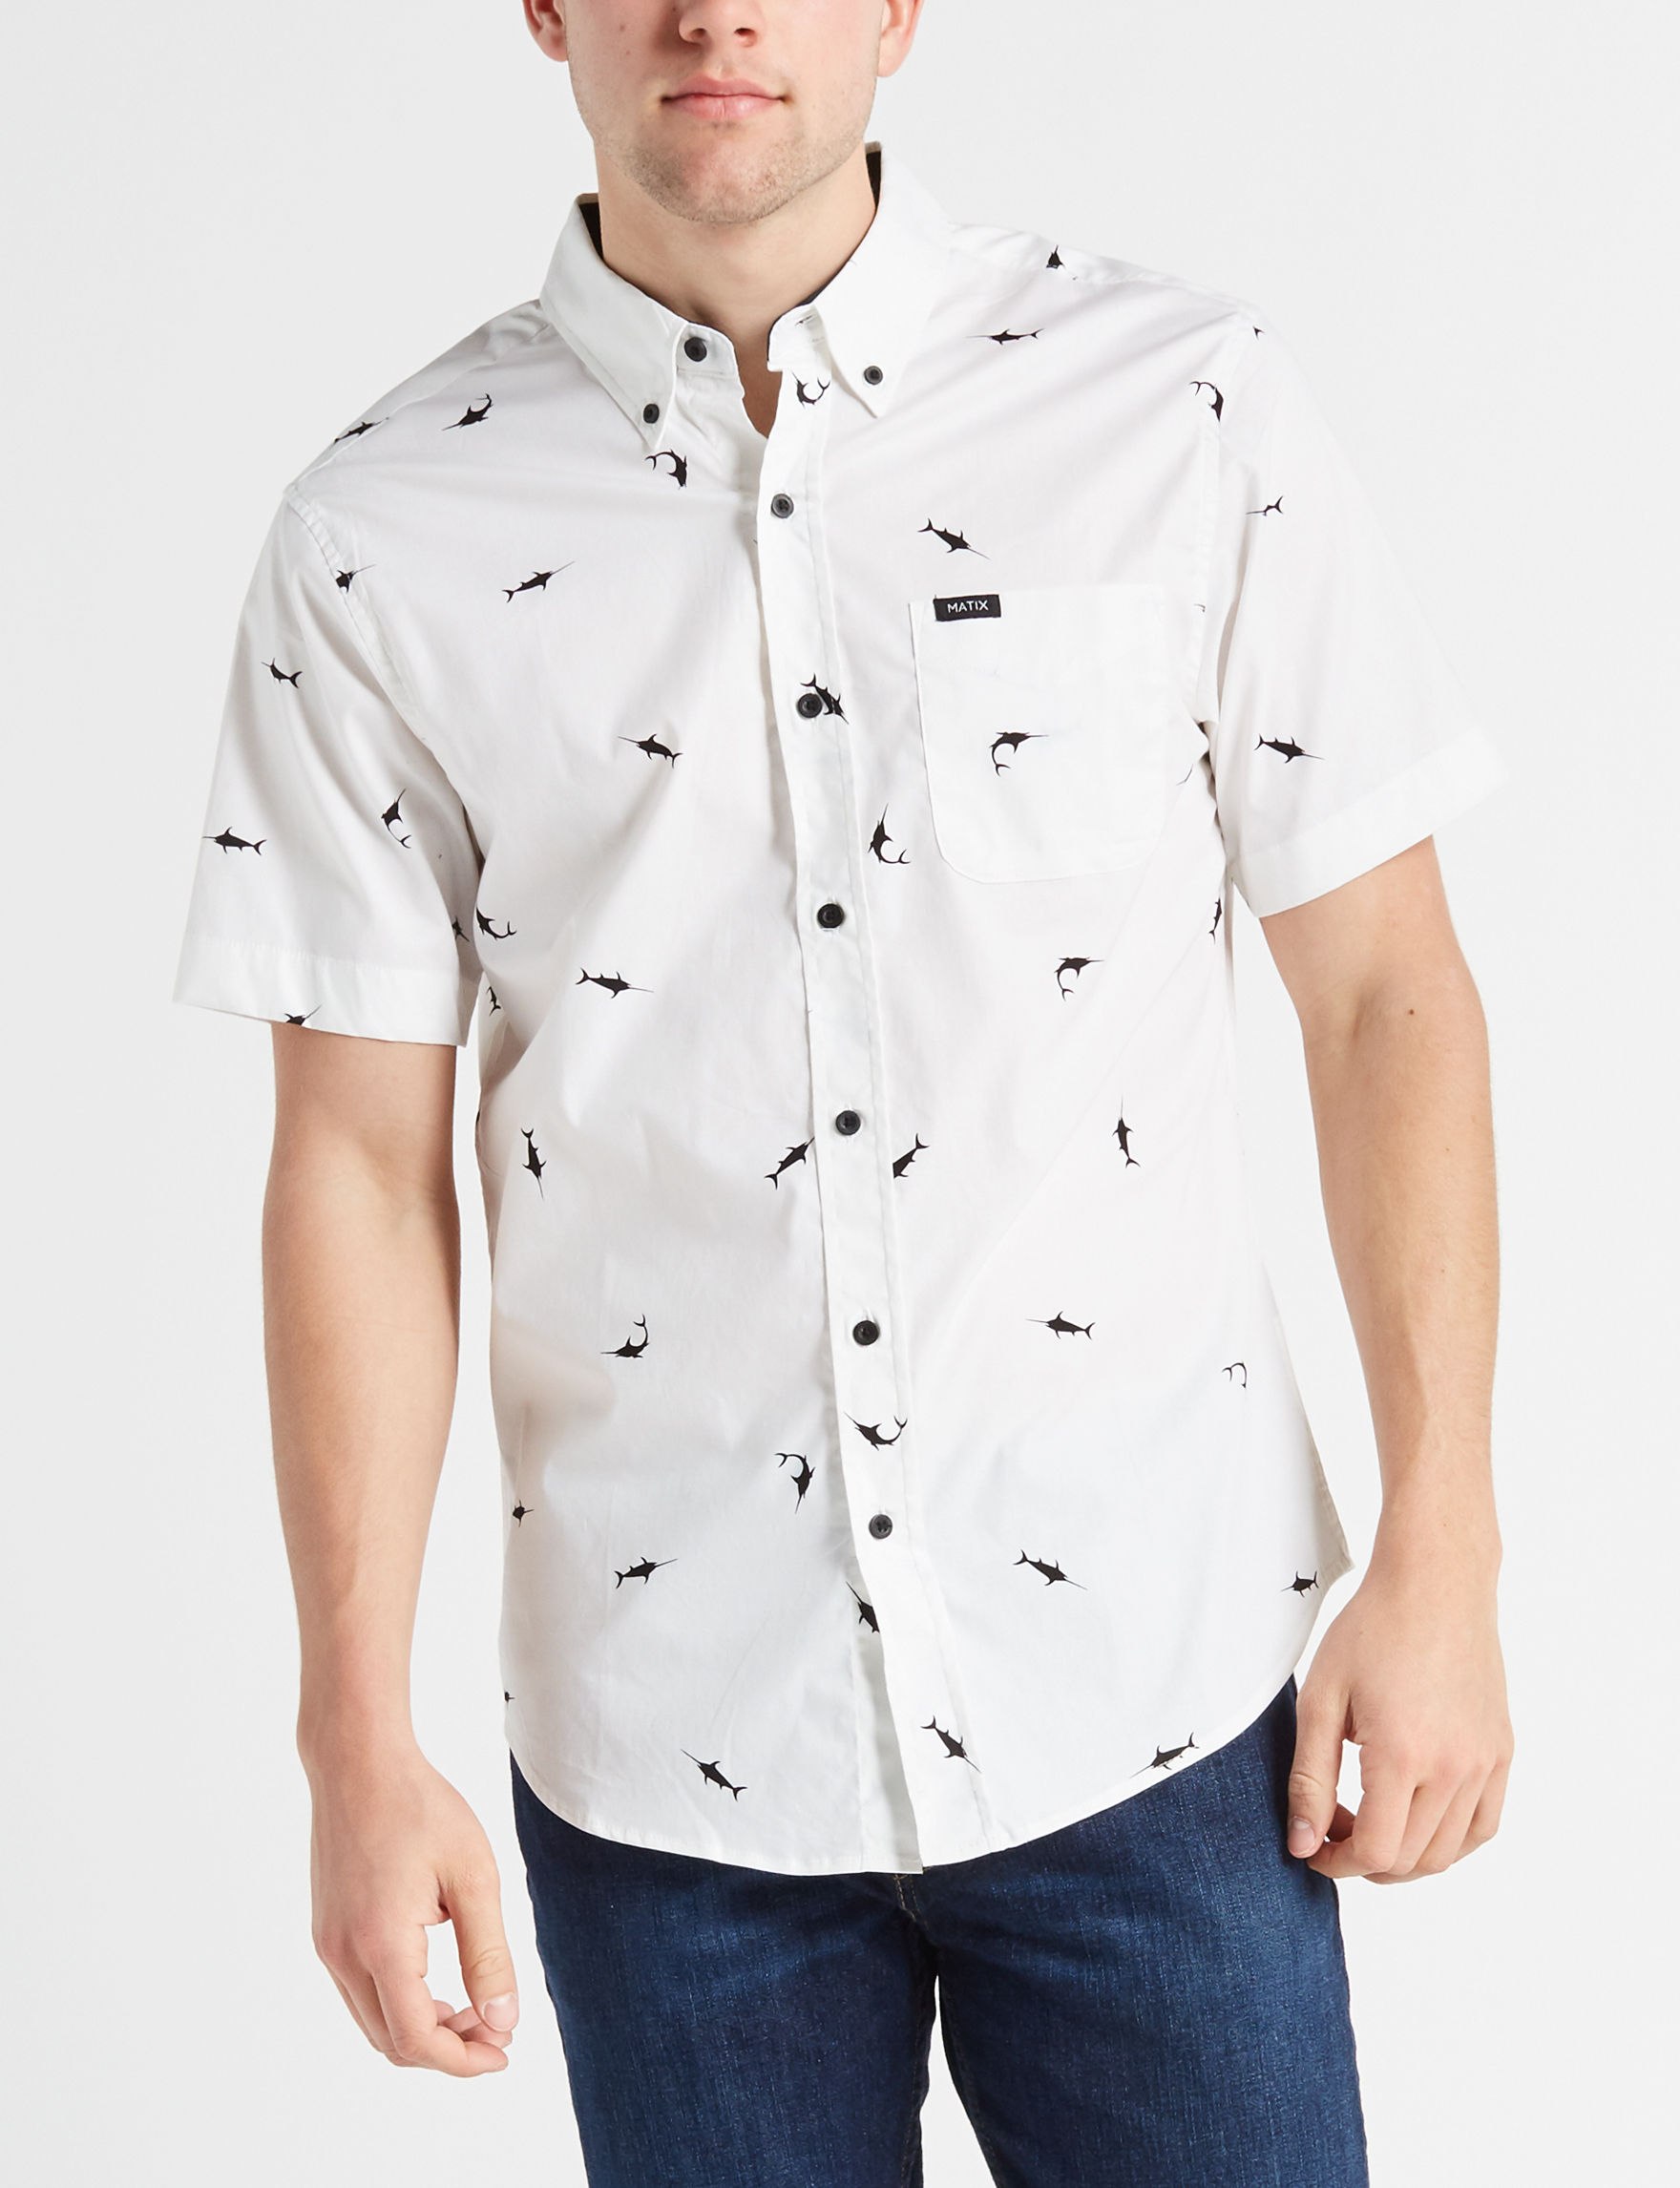 Surplus White Casual Button Down Shirts